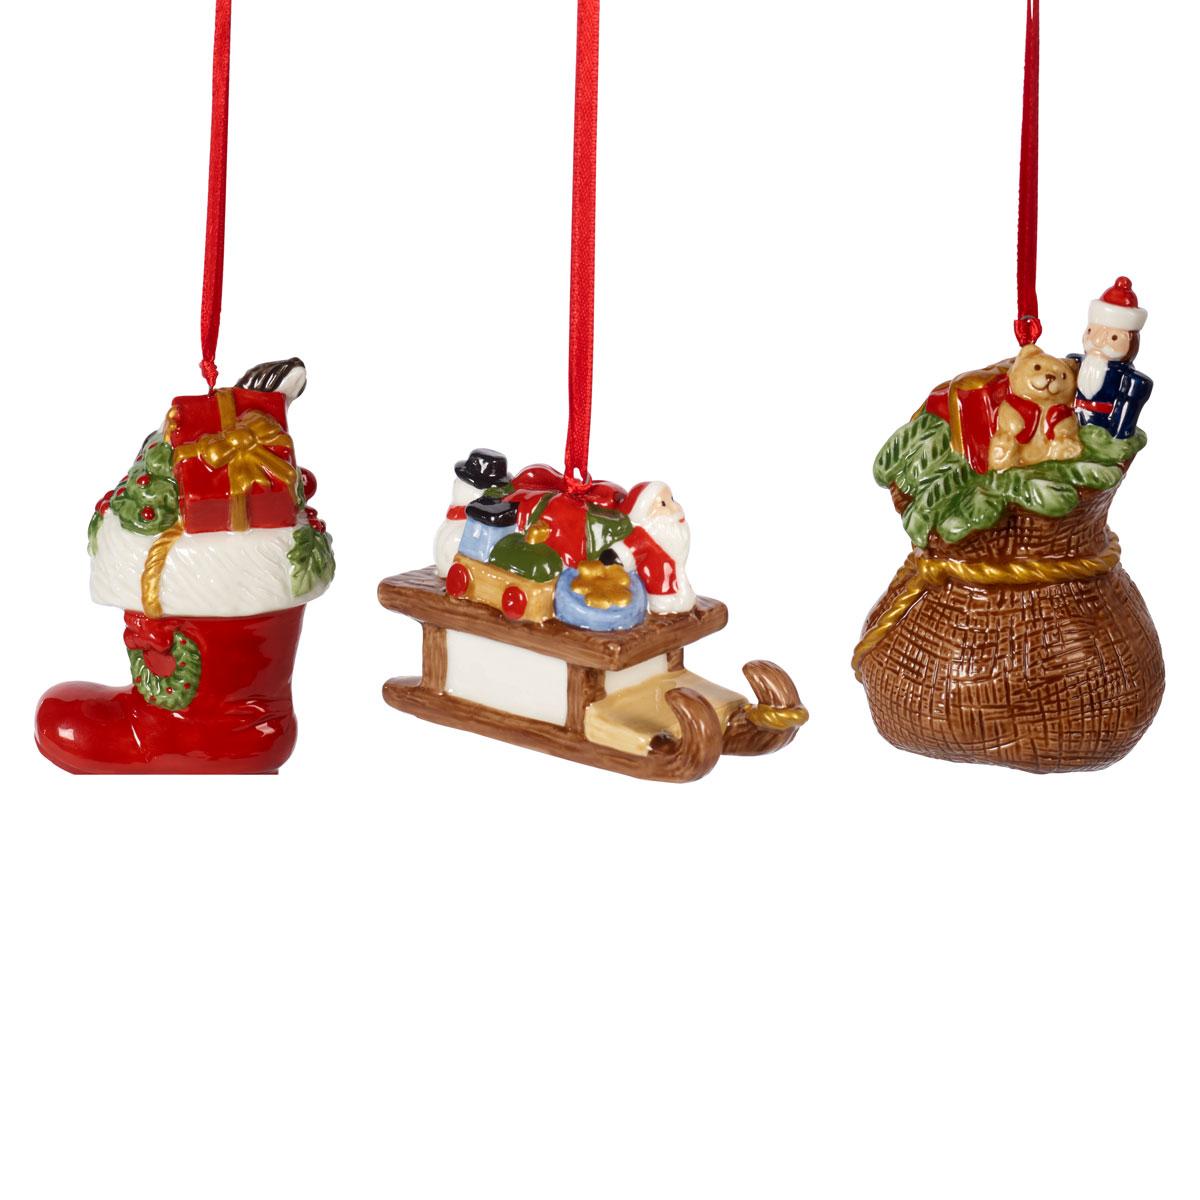 Villeroy and Boch 2021 Nostalgic Ornaments Set of Three